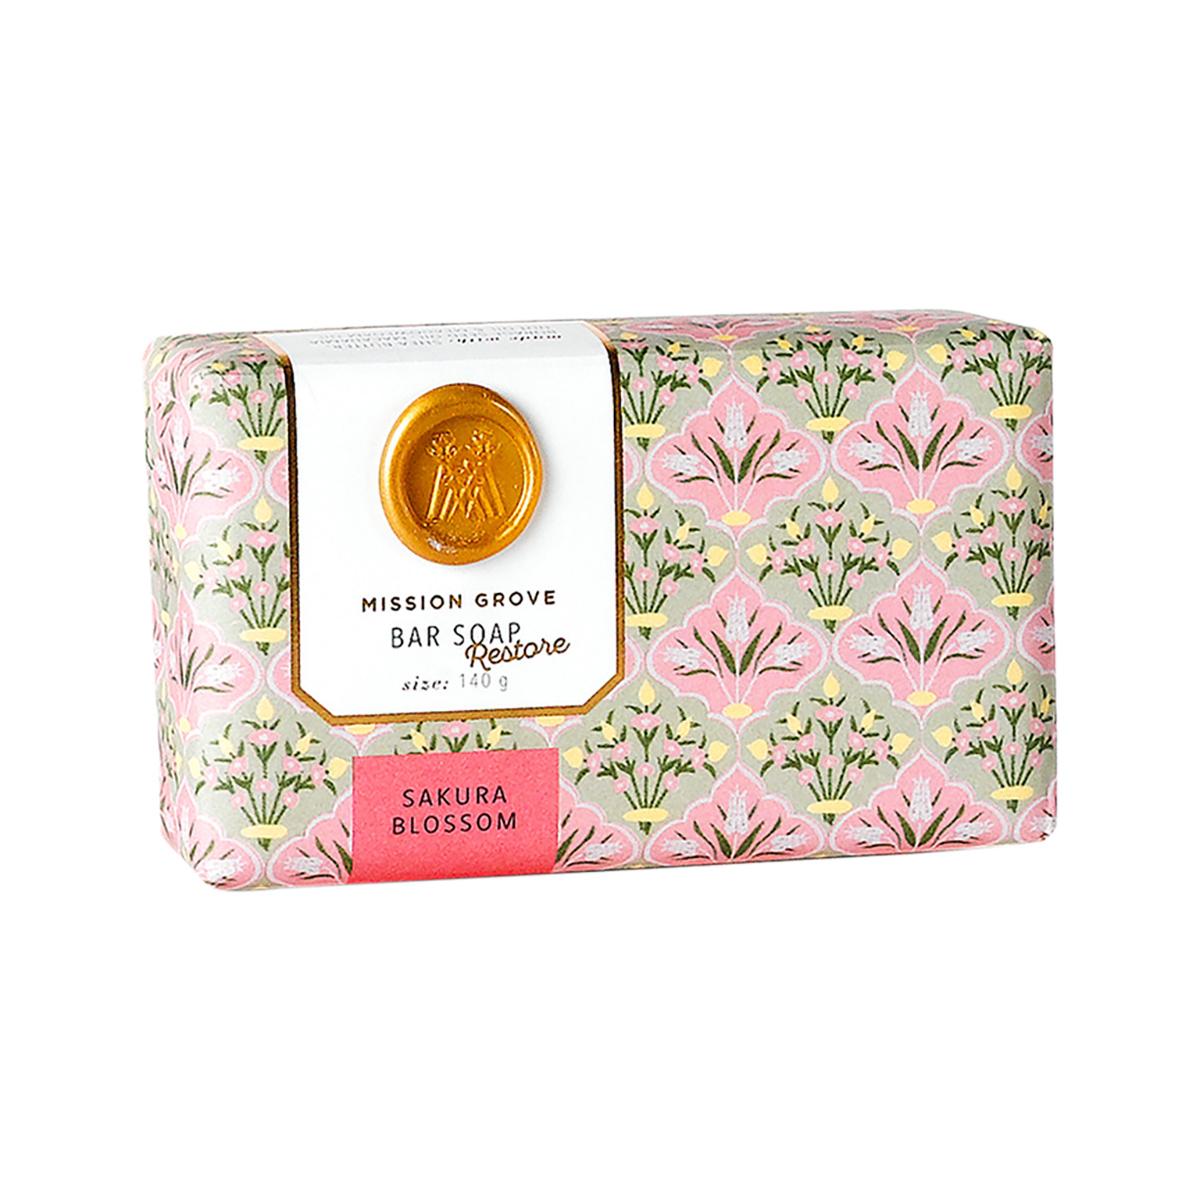 Sakura blossom soap